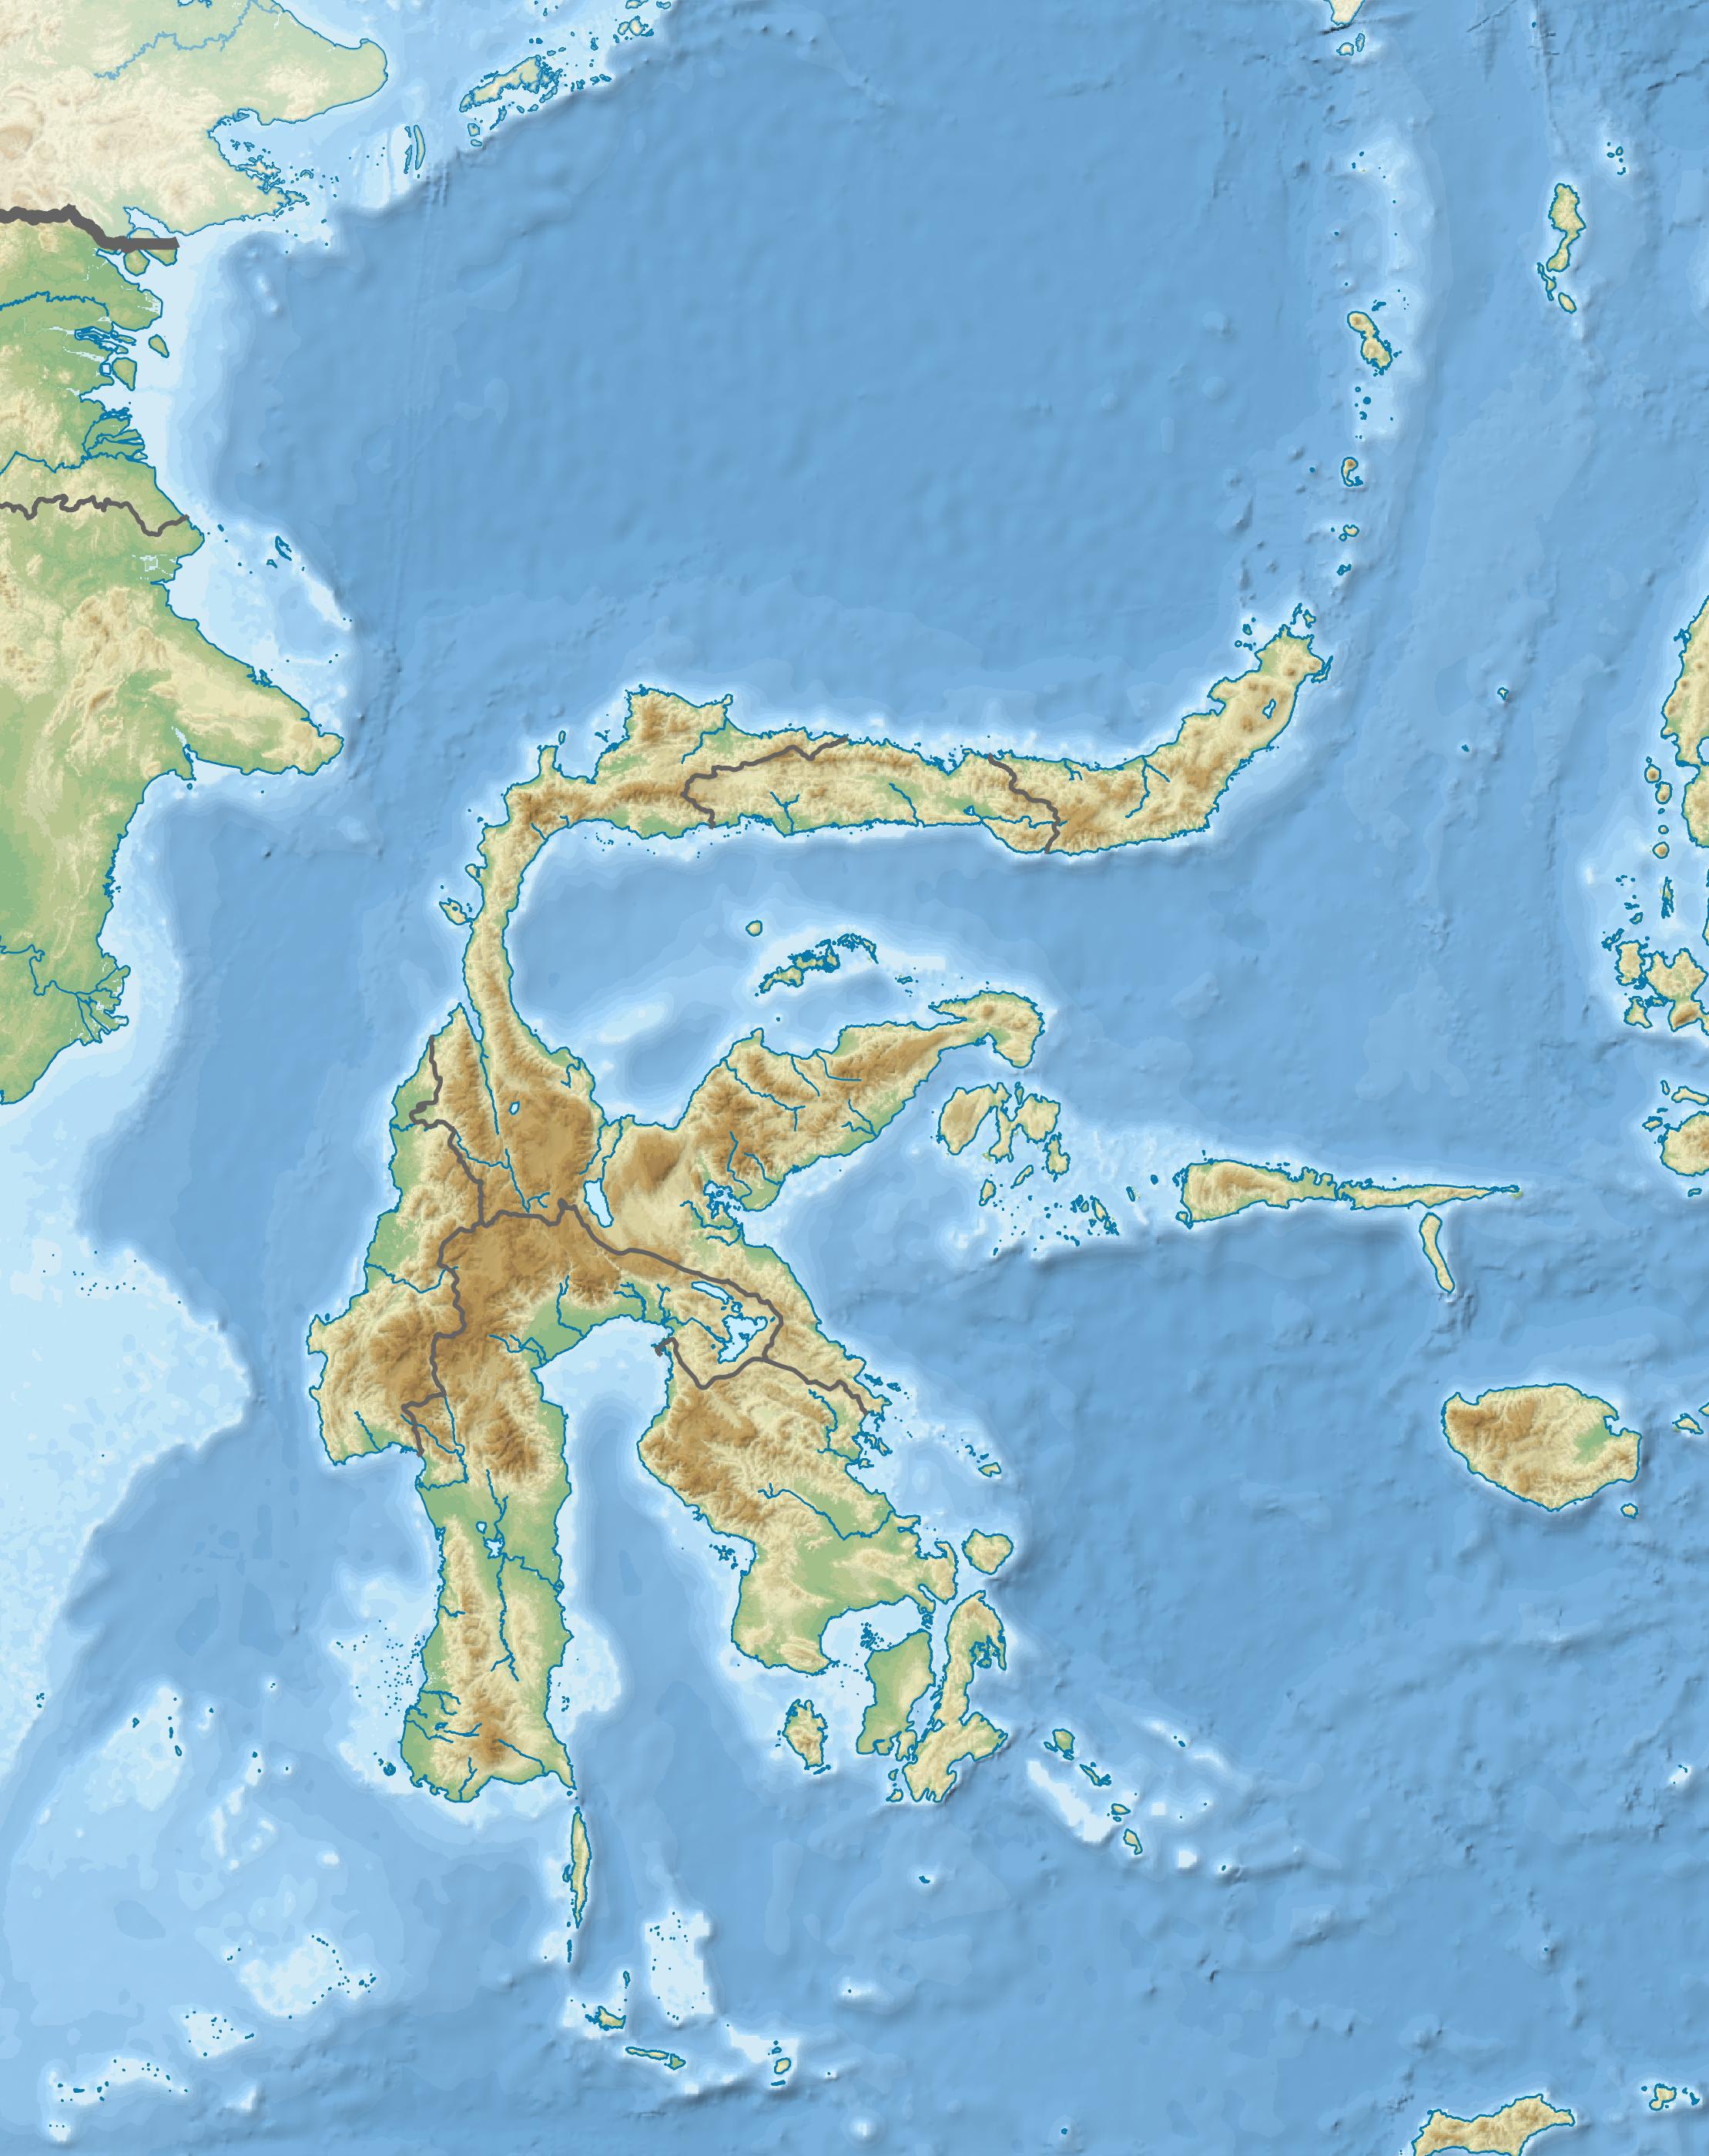 زلزال بقوة درجات يضرب قبالة Sulawesi_topography_plain.png